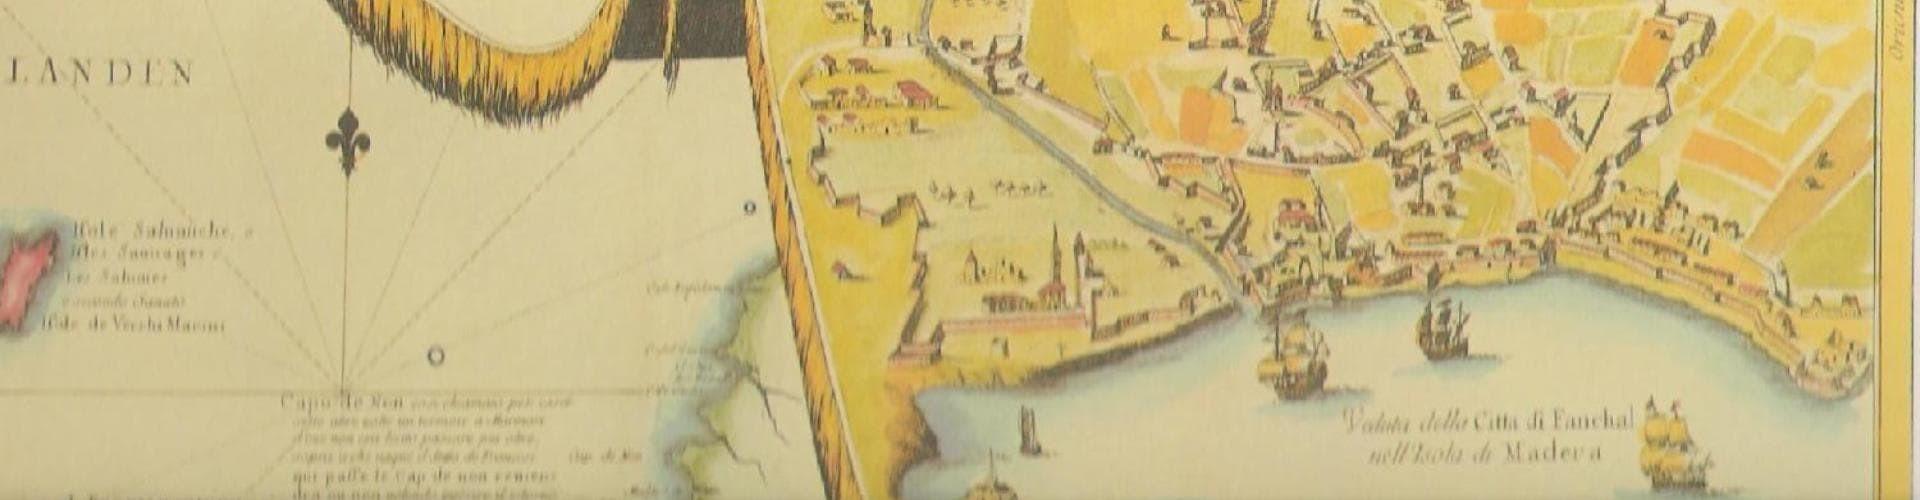 Madeira Island History